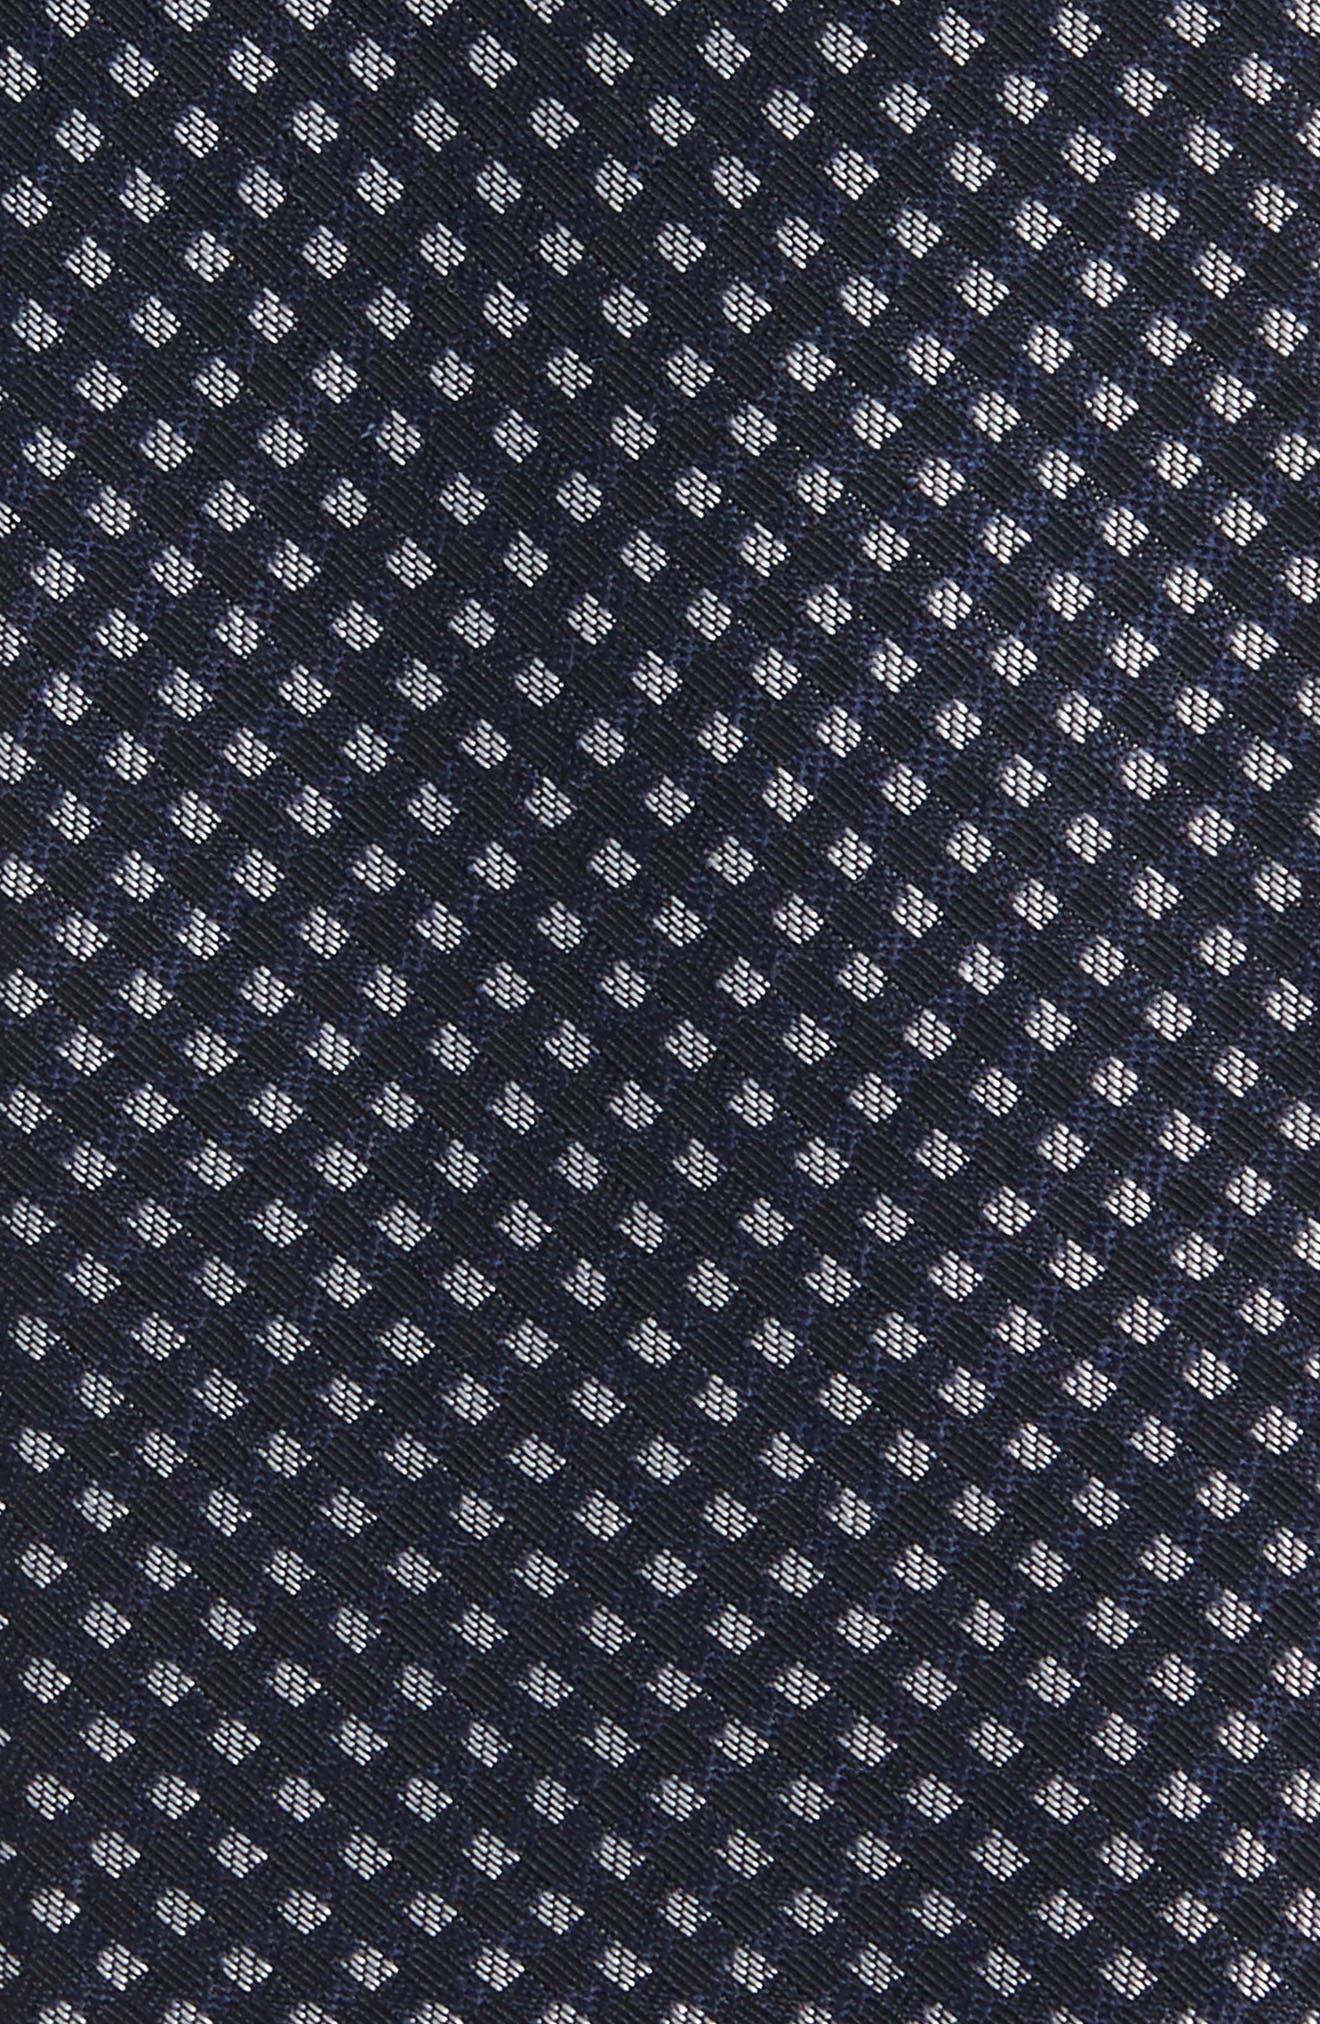 Alternate Image 2  - Calibrate Midnight Silk Tie